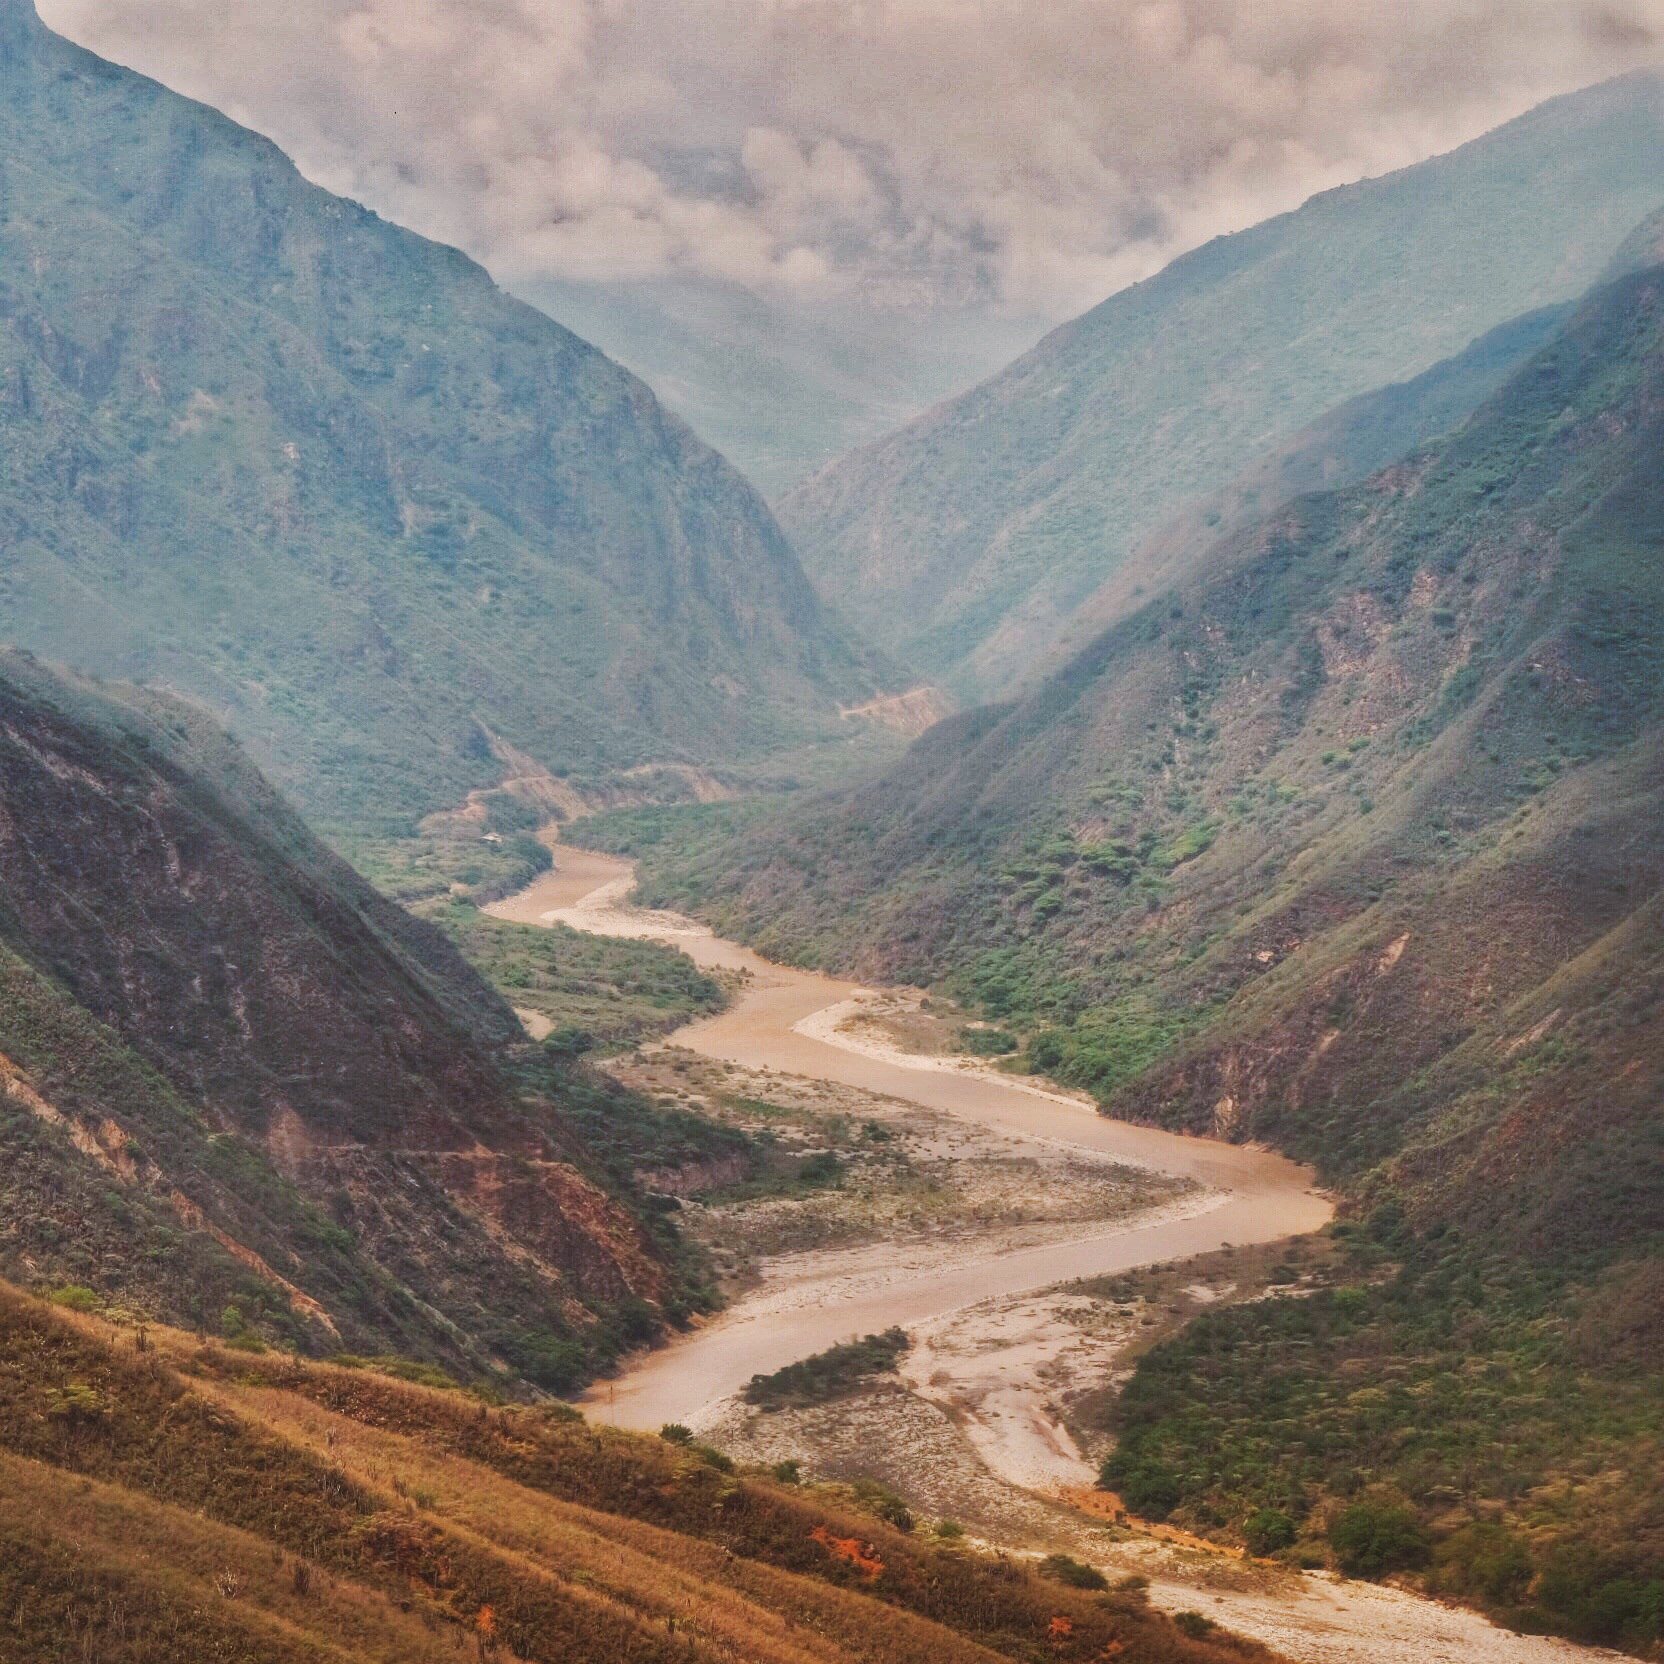 The impressive Chicamocha canyon, on the way from  San Gil  to  Bucaramanga .